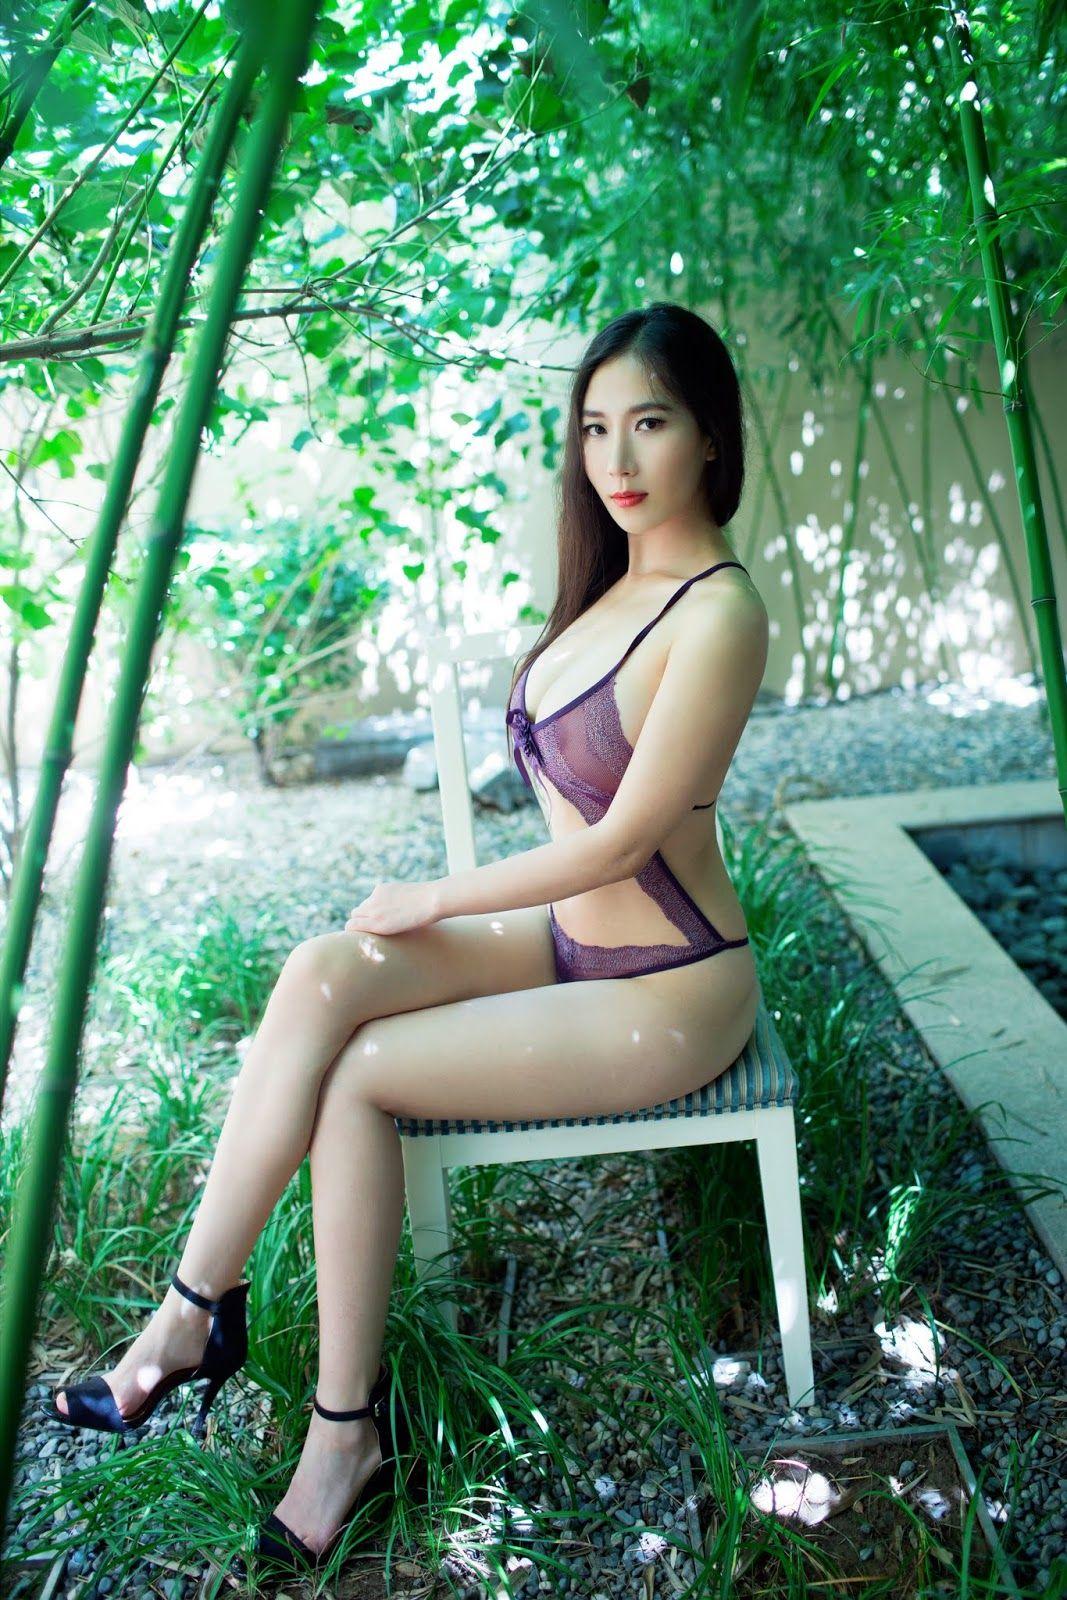 ucgalleries Asian girl